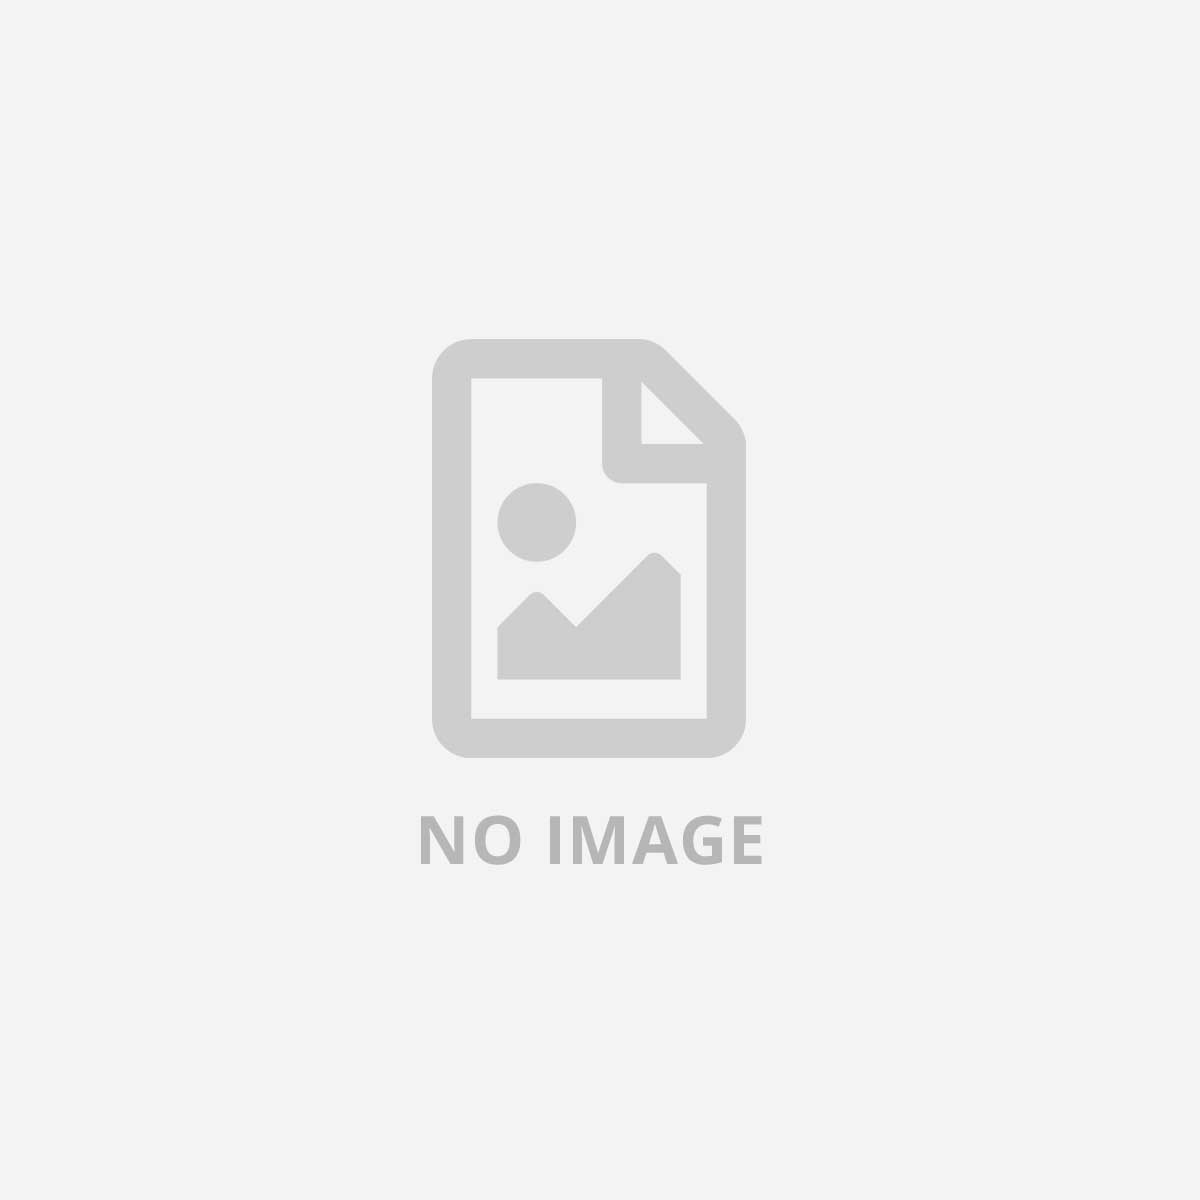 NILOX PCI ADAPTER 4+1 USB PORTS